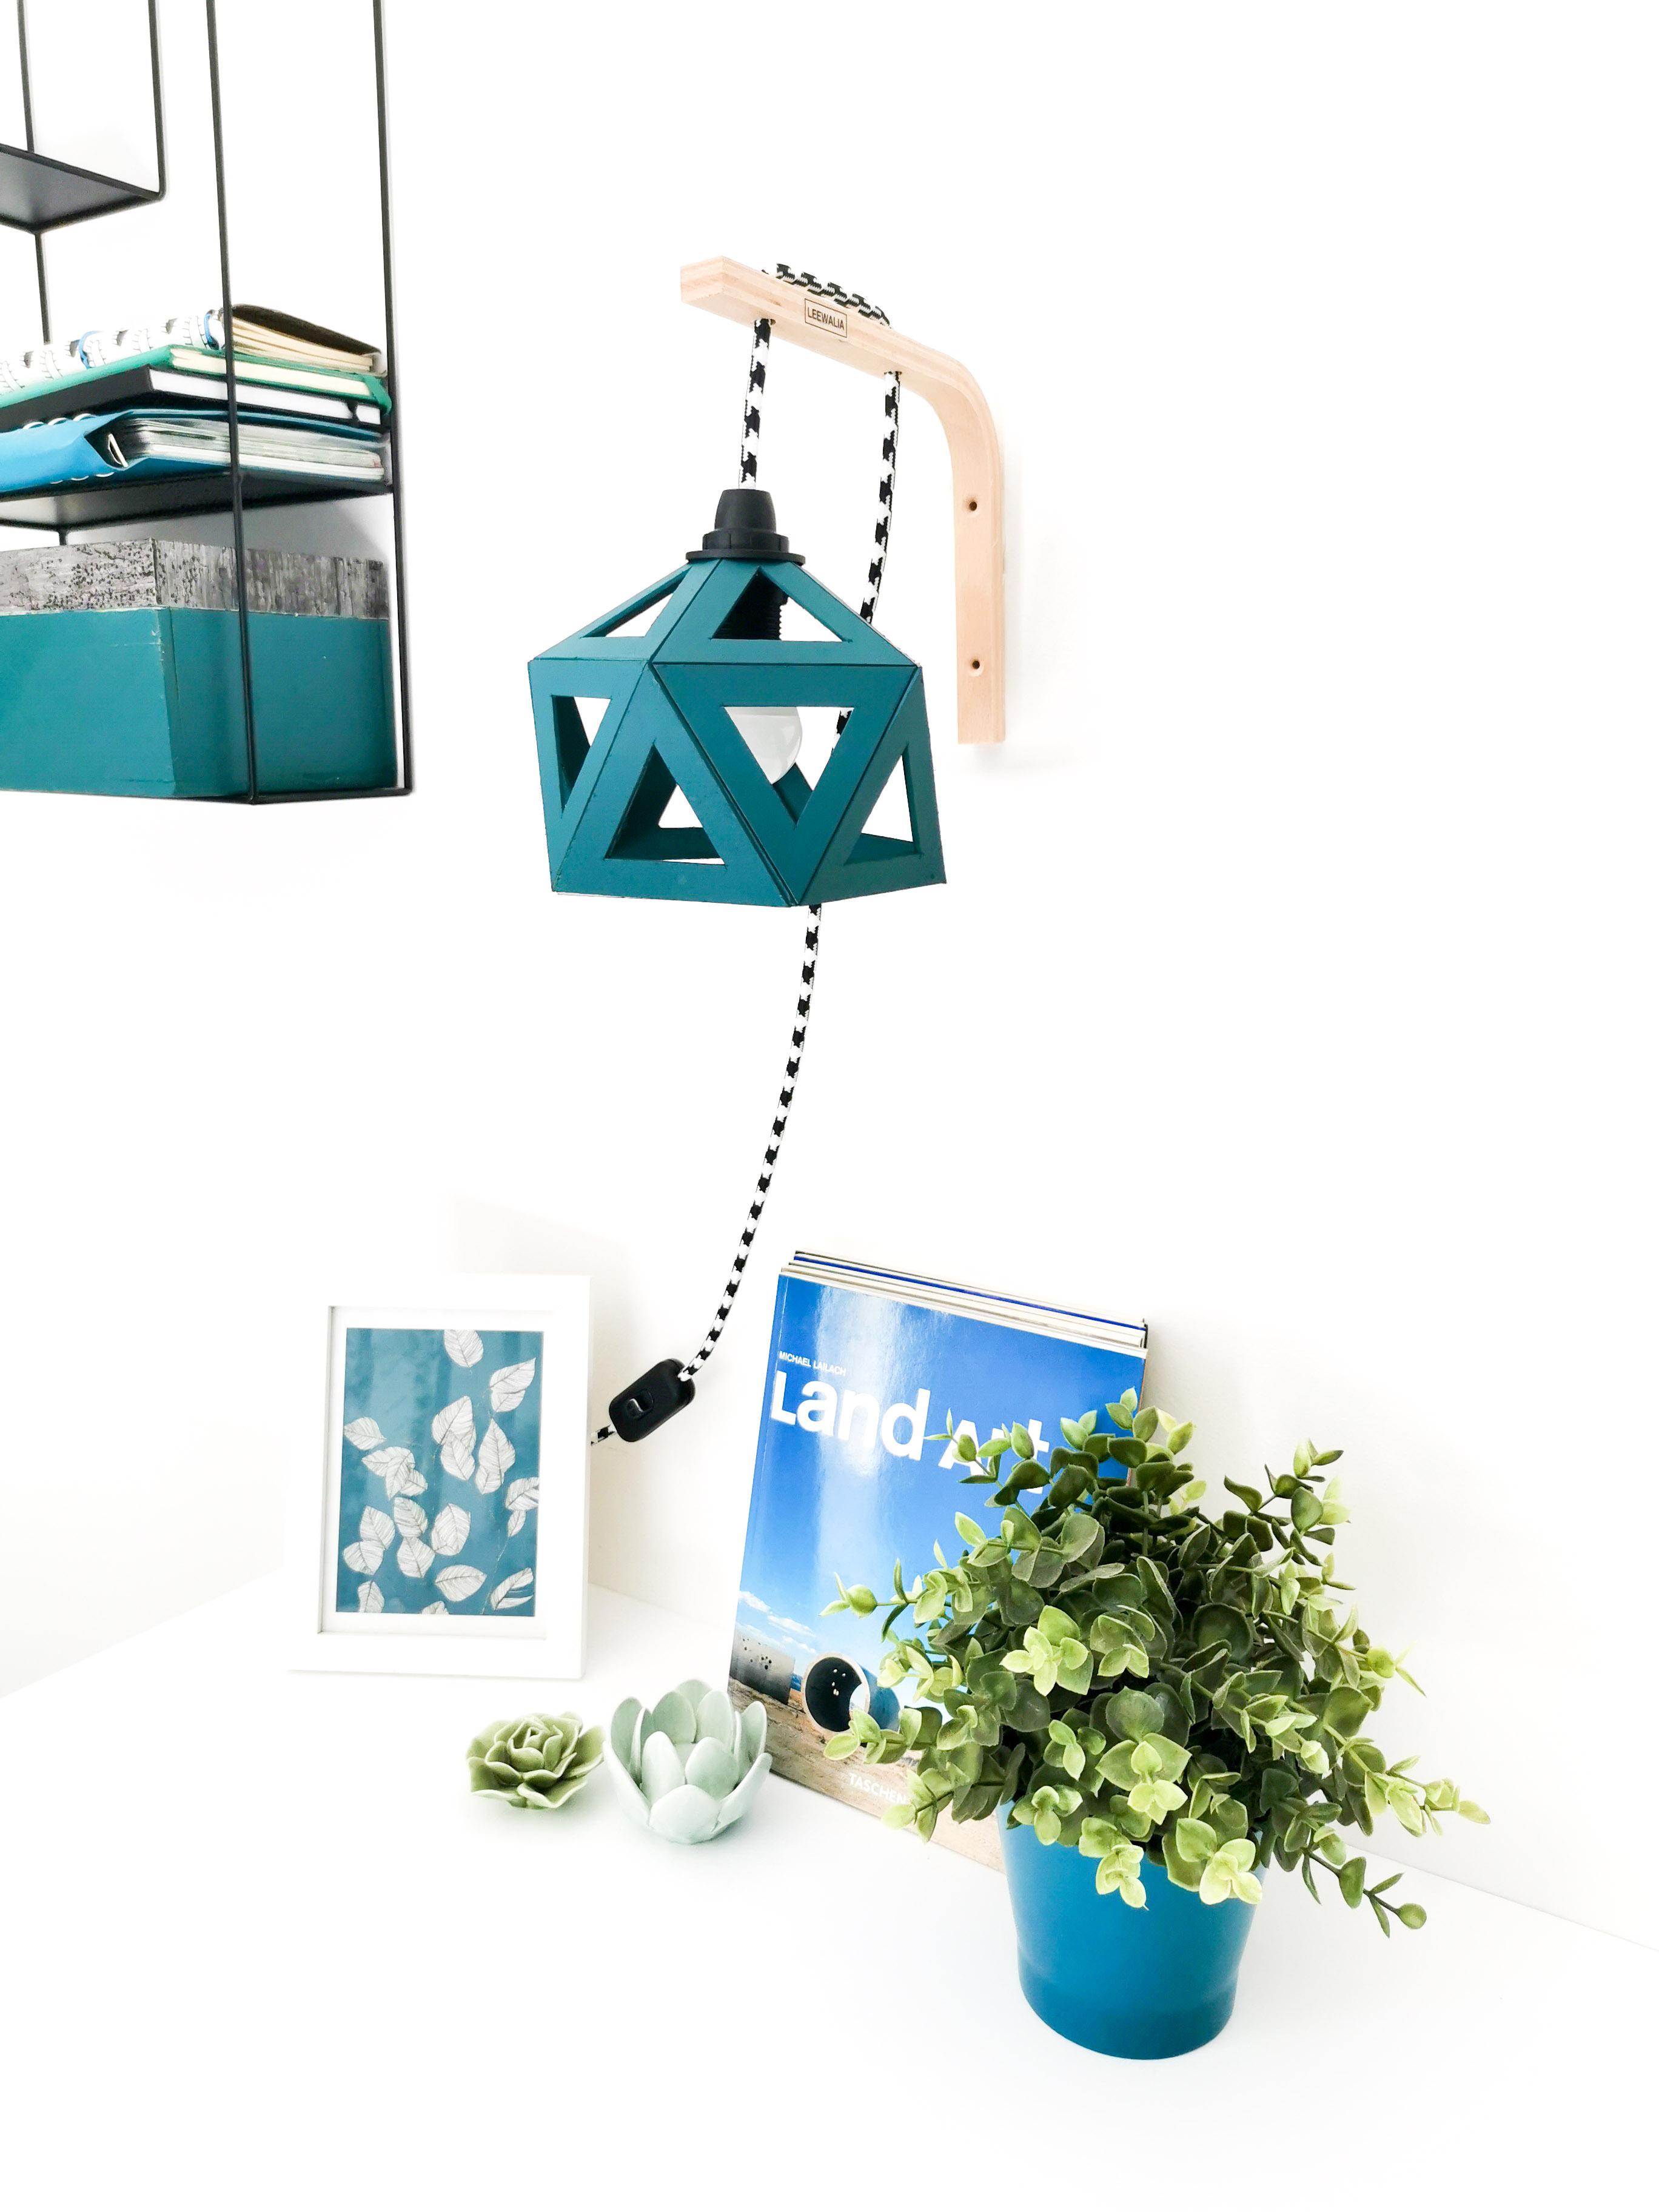 Applique Murale Origami Bleu Canard - Leewalia - Mon Petit Plus tout Origami Canard